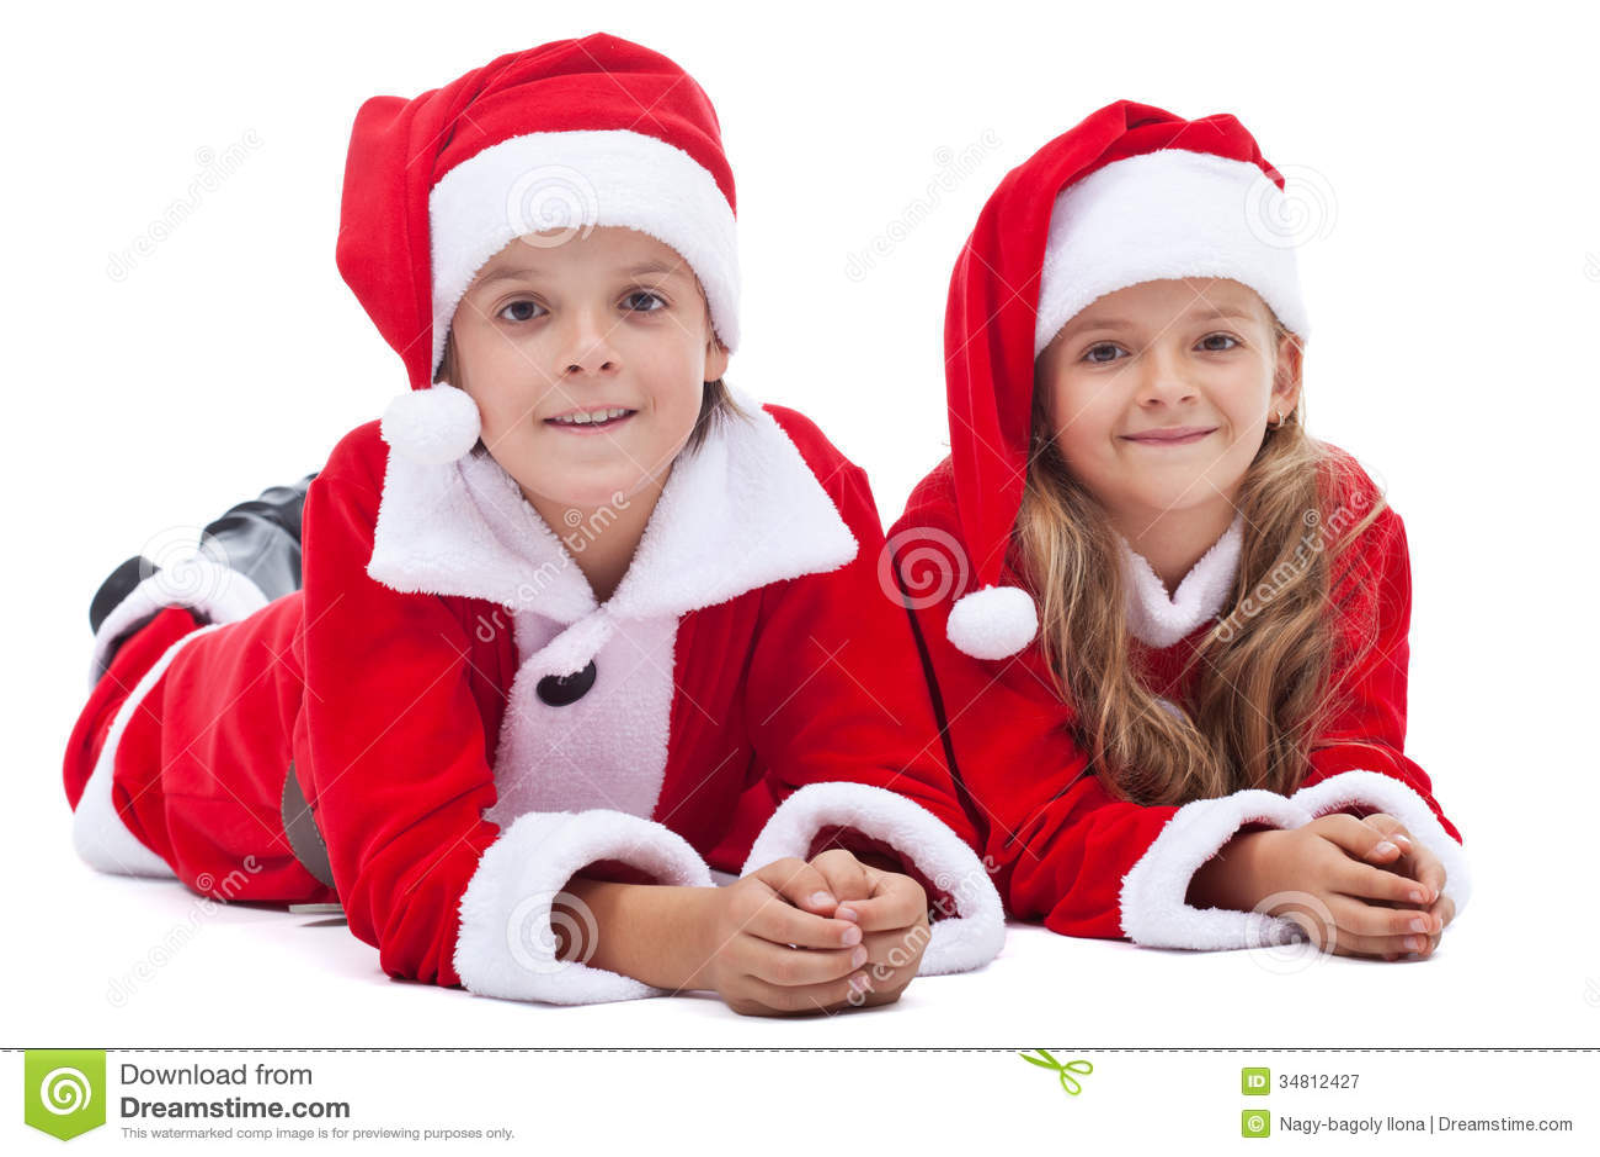 royalty free stock photo - Kids Santa